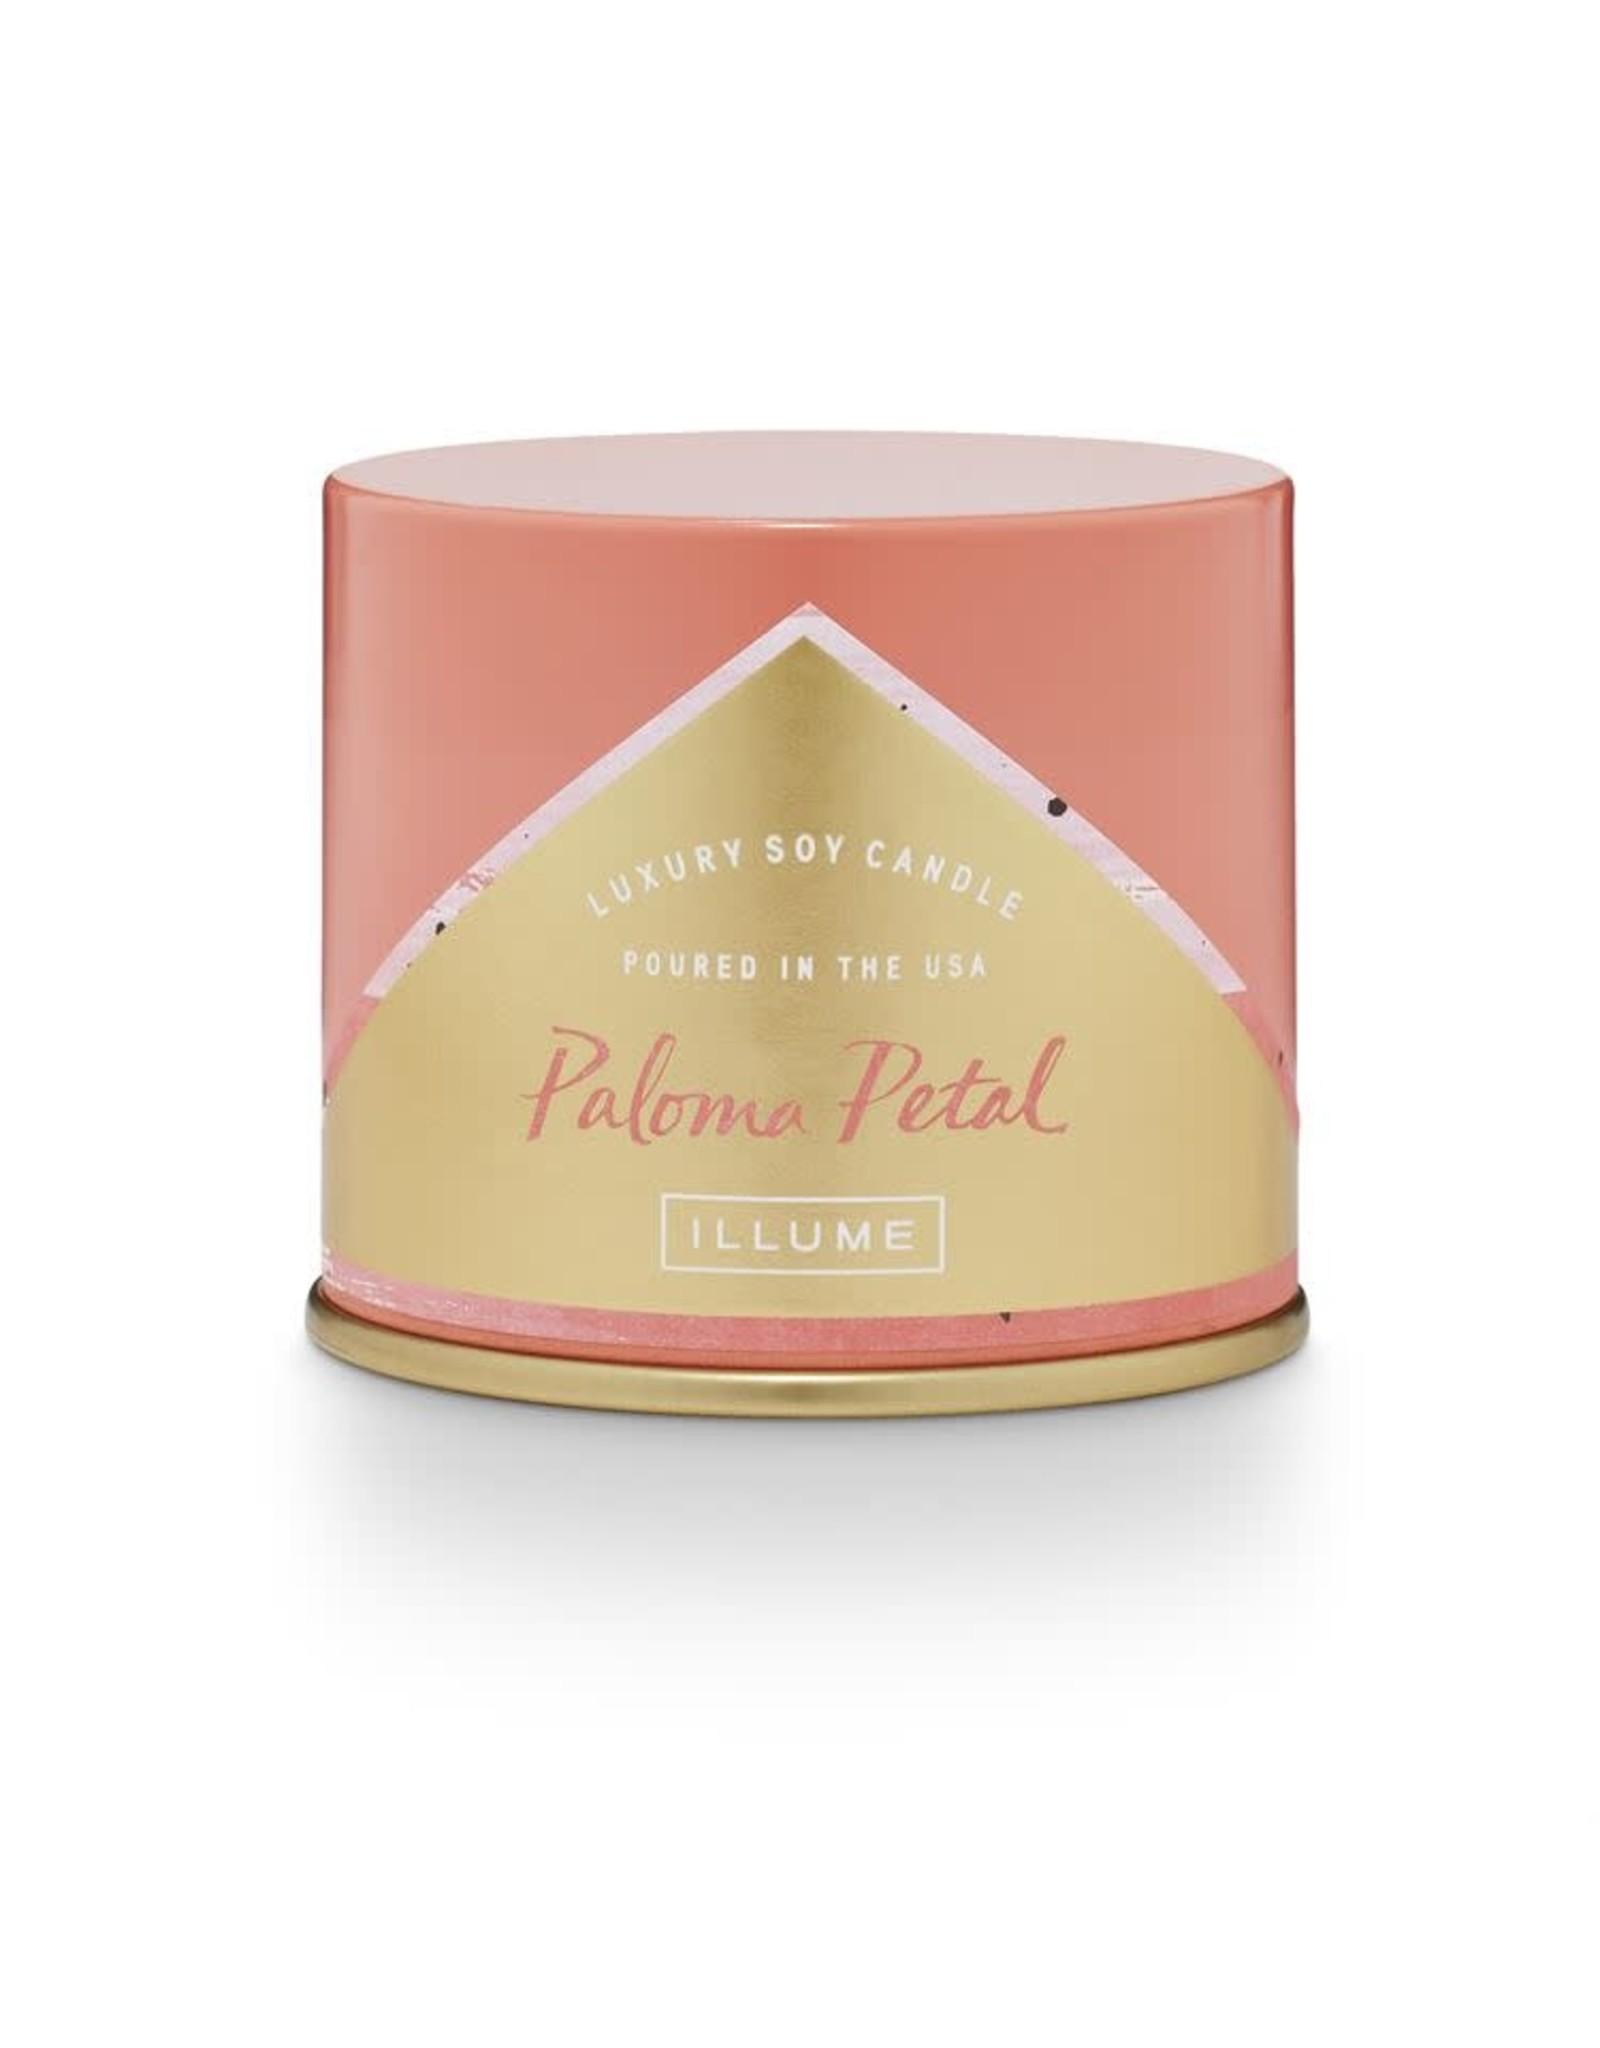 Illume Paloma Petal Metal Candle - 11.8 oz